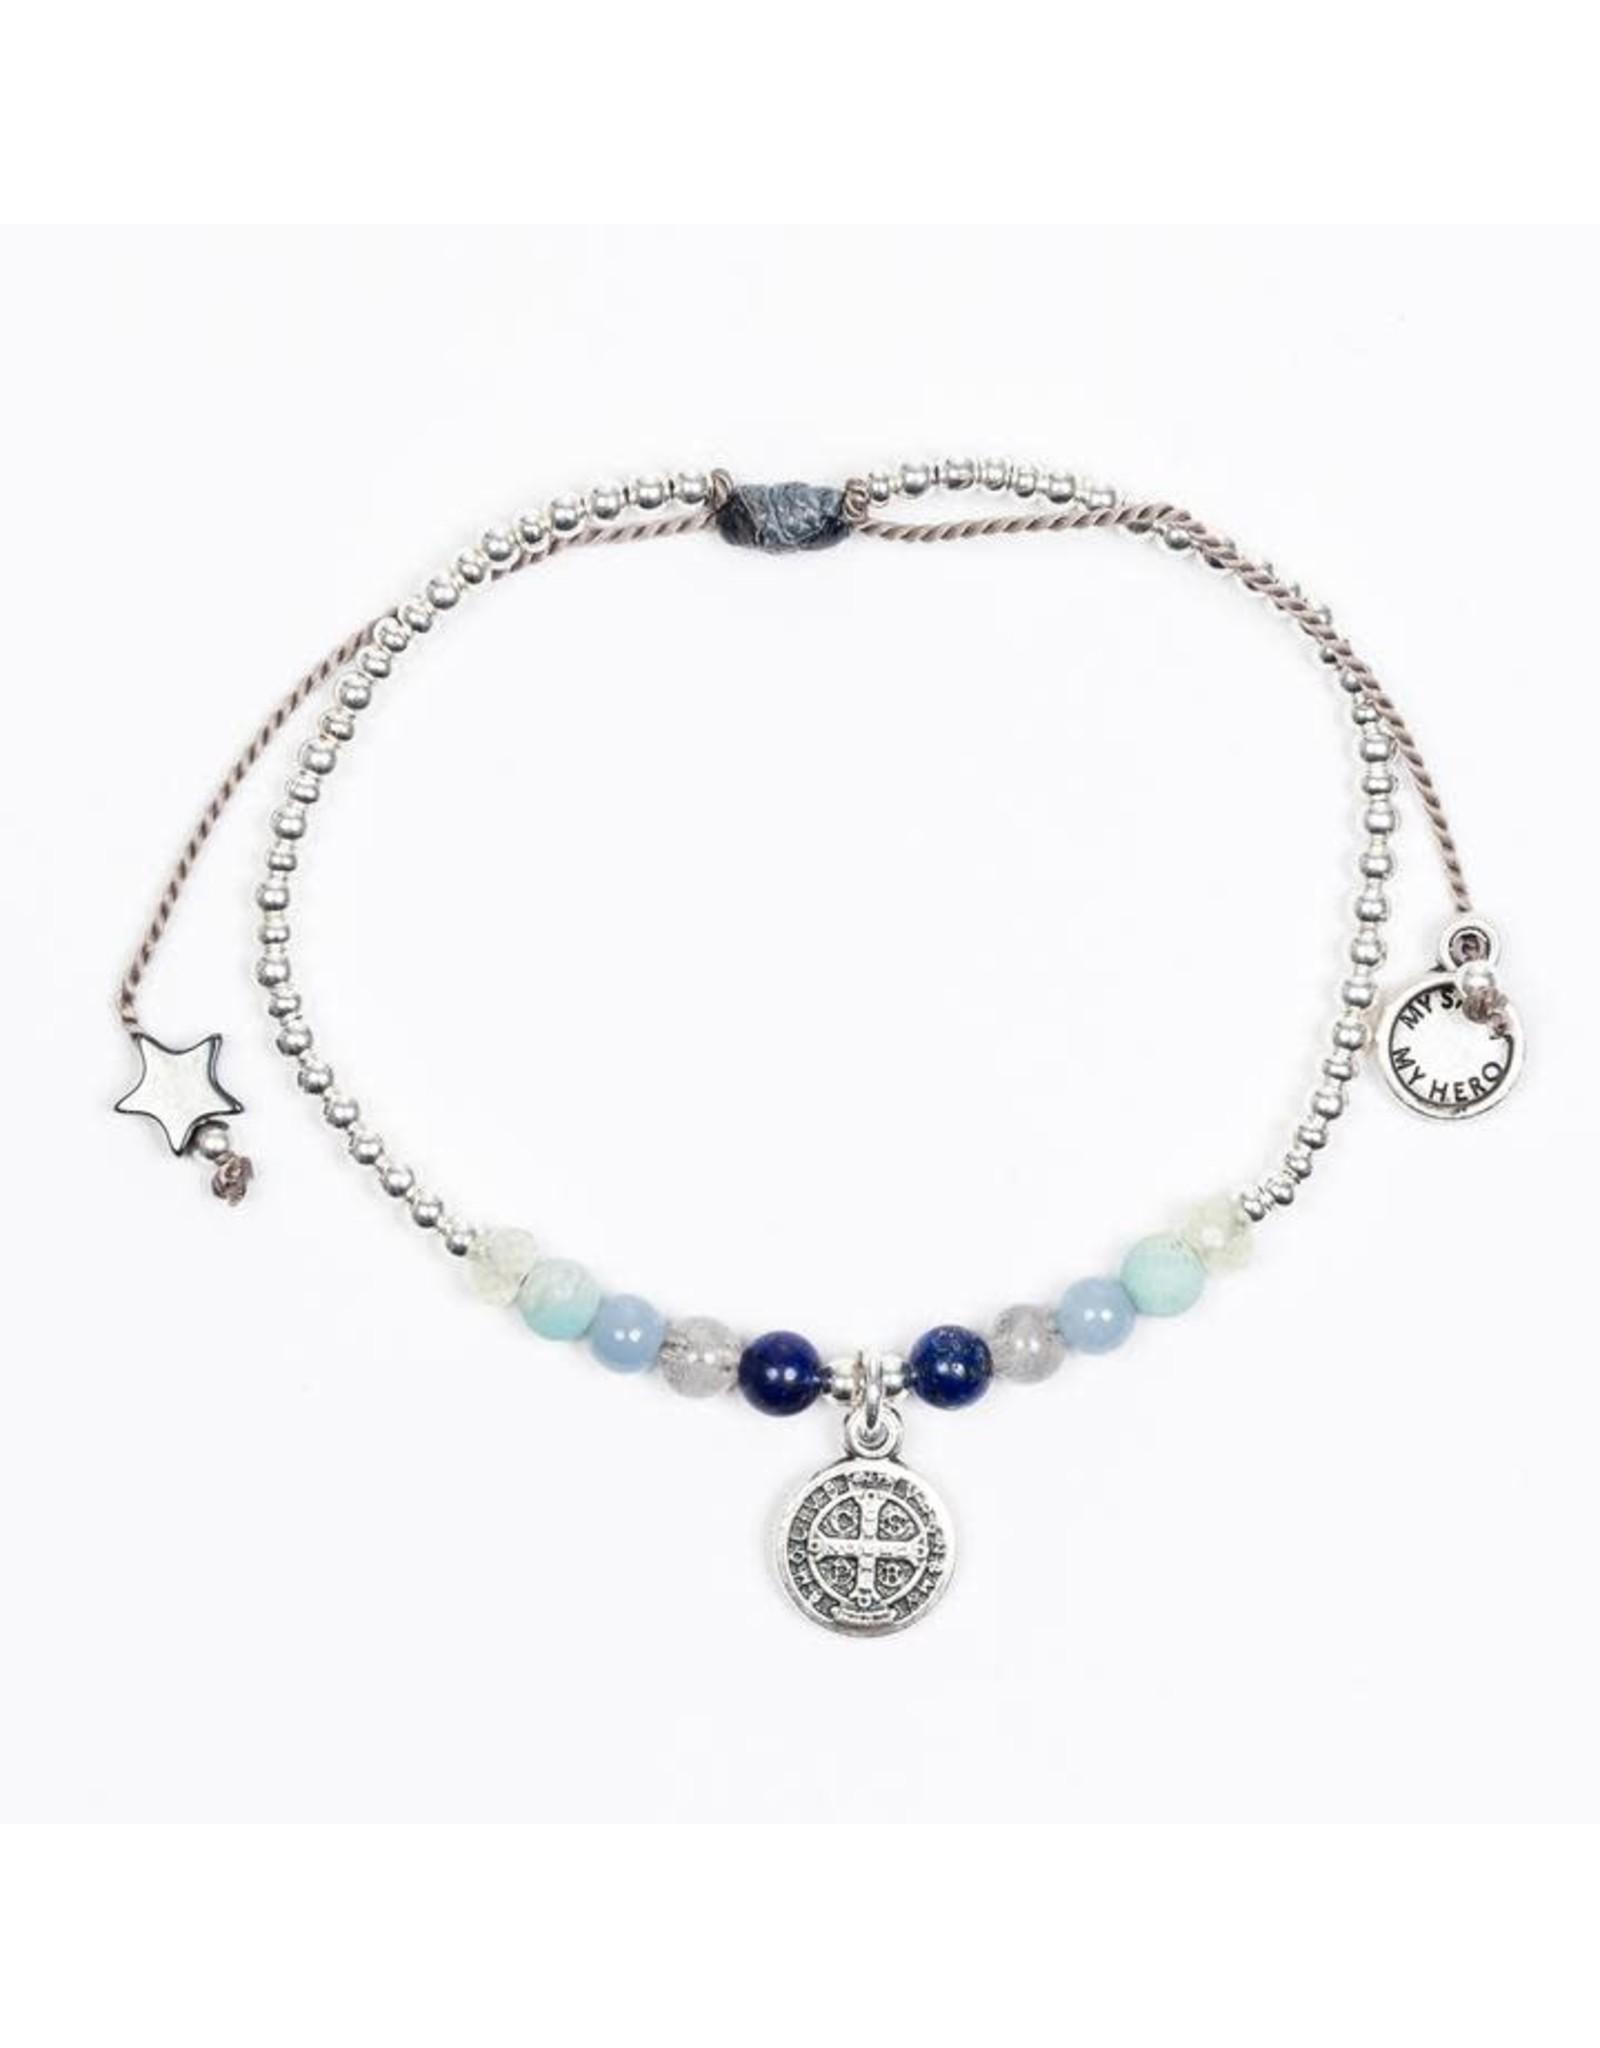 Family Virtues Bracelet Silver/Mix Gemstones